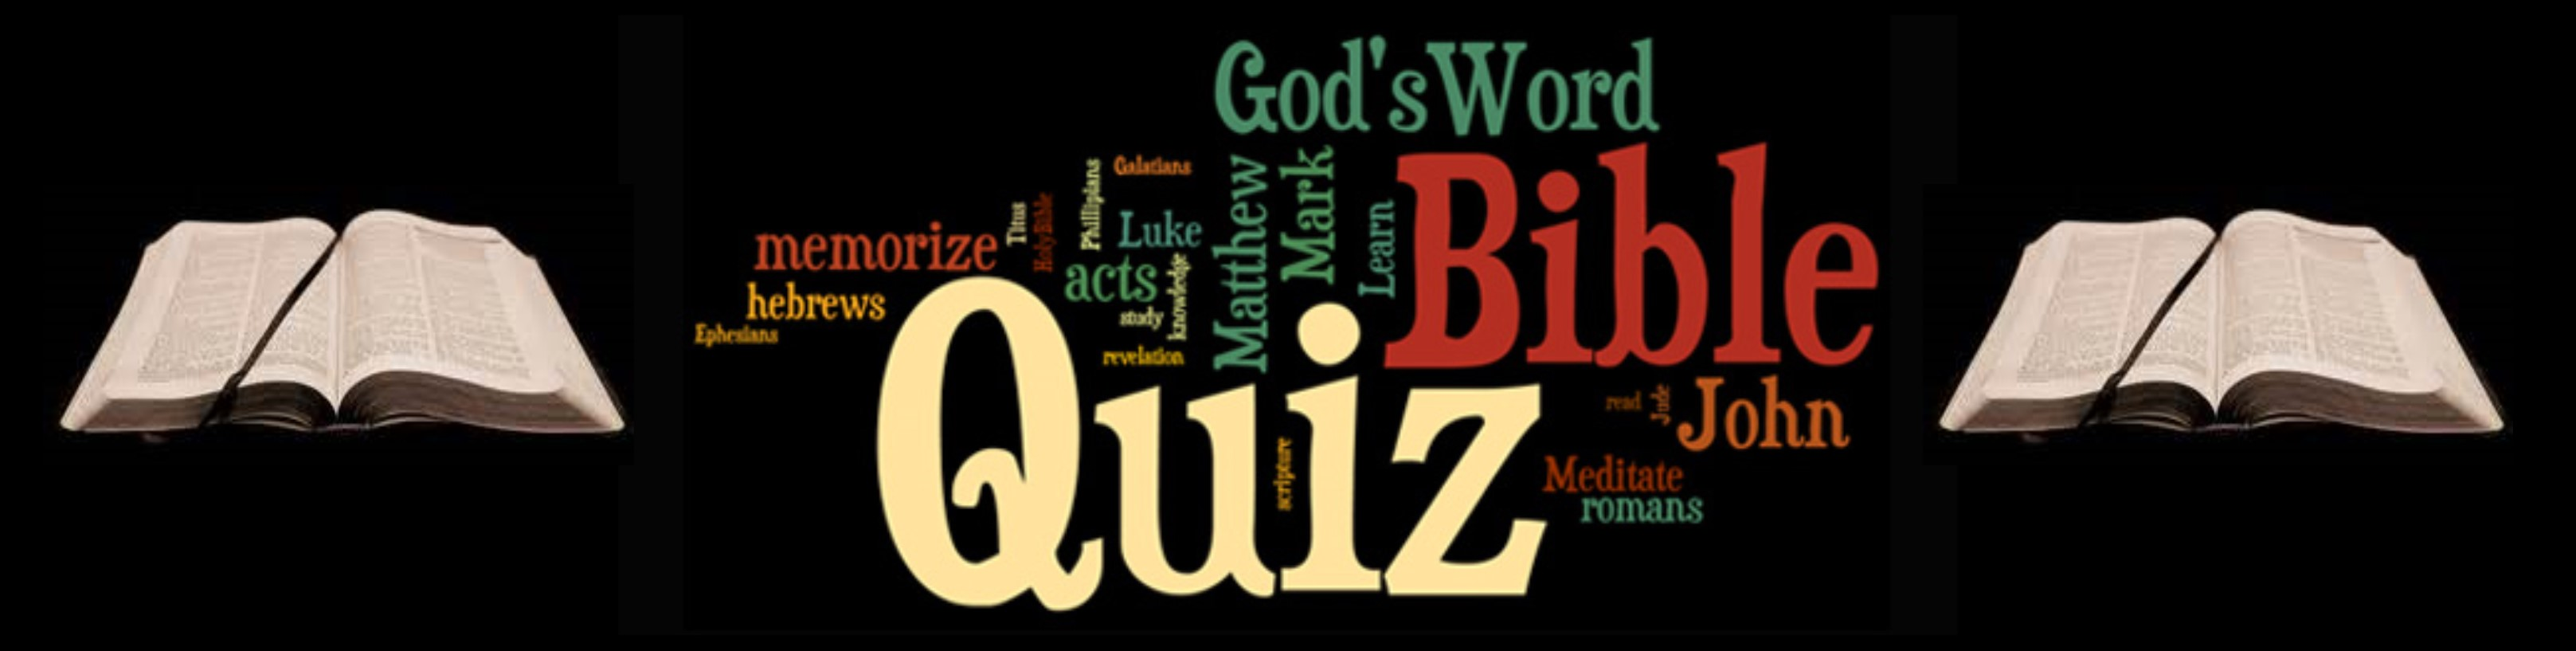 Matrimonio Biblia Quiz : Bible quizzes jesus to my rescue